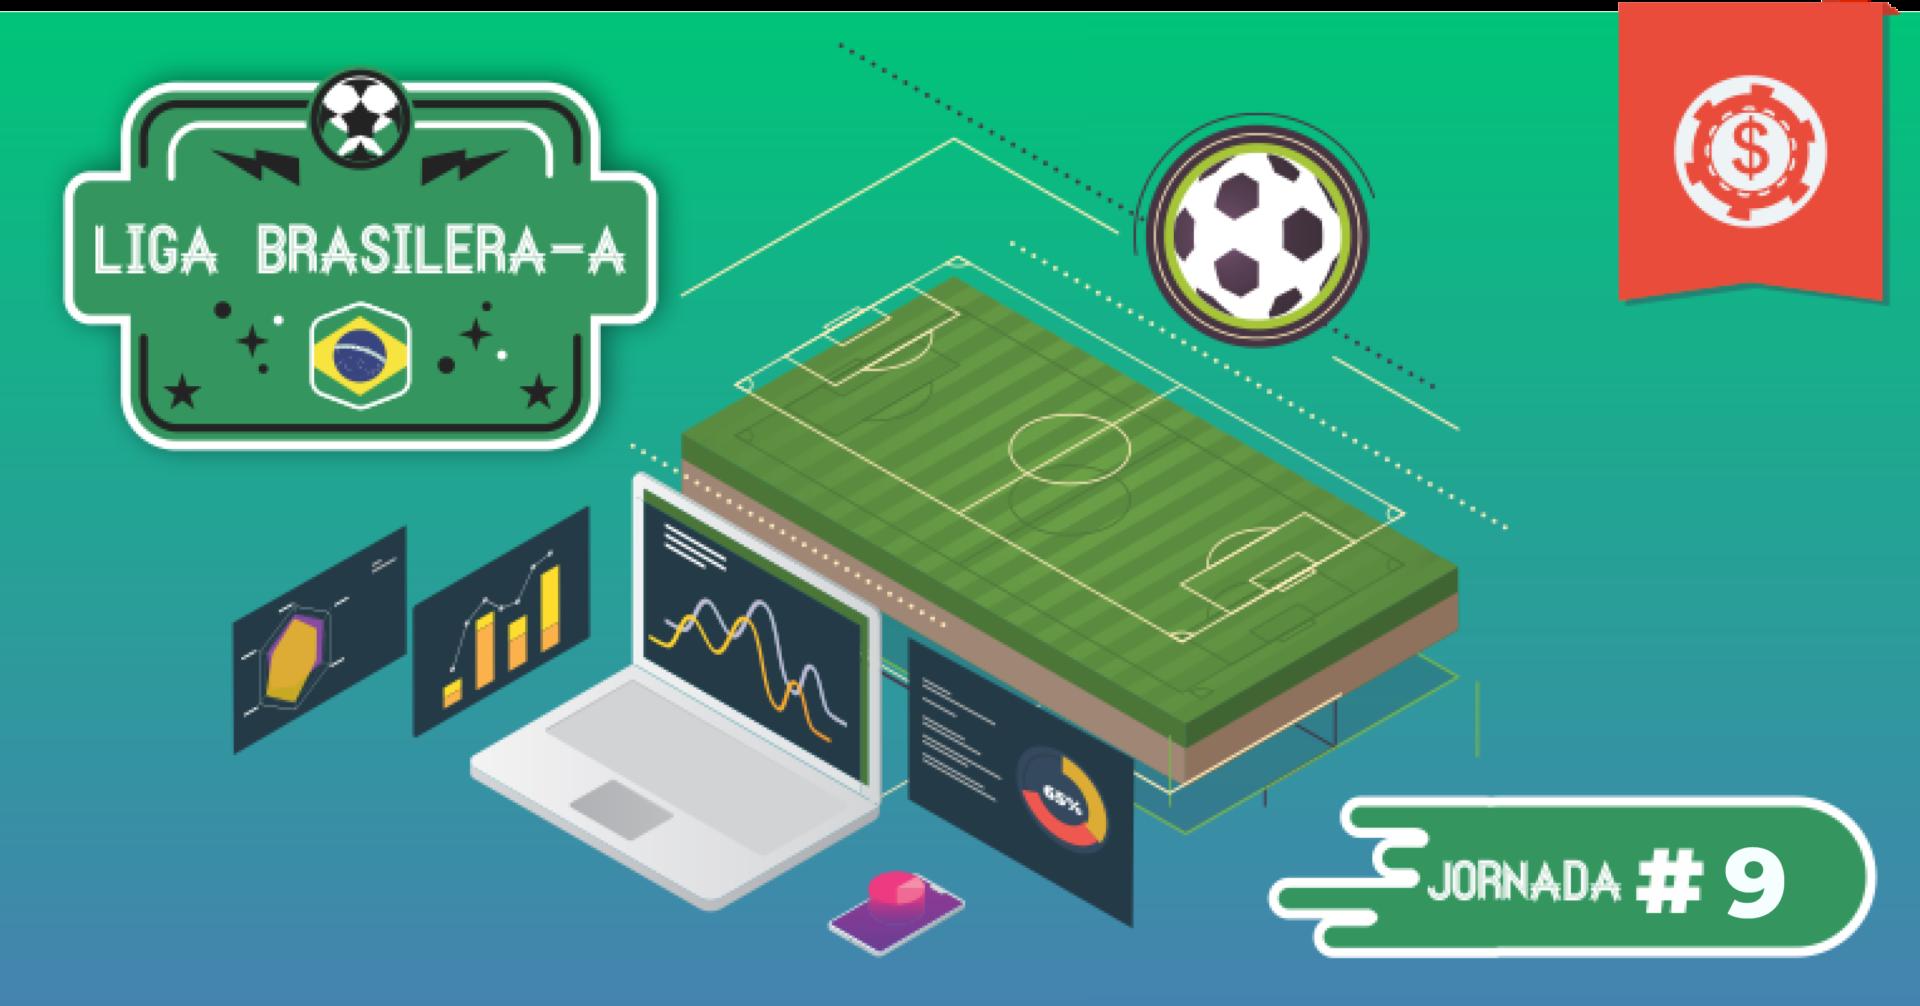 pronosticos-liga-brasilera-primera-division-apuestas-jornada-9-1